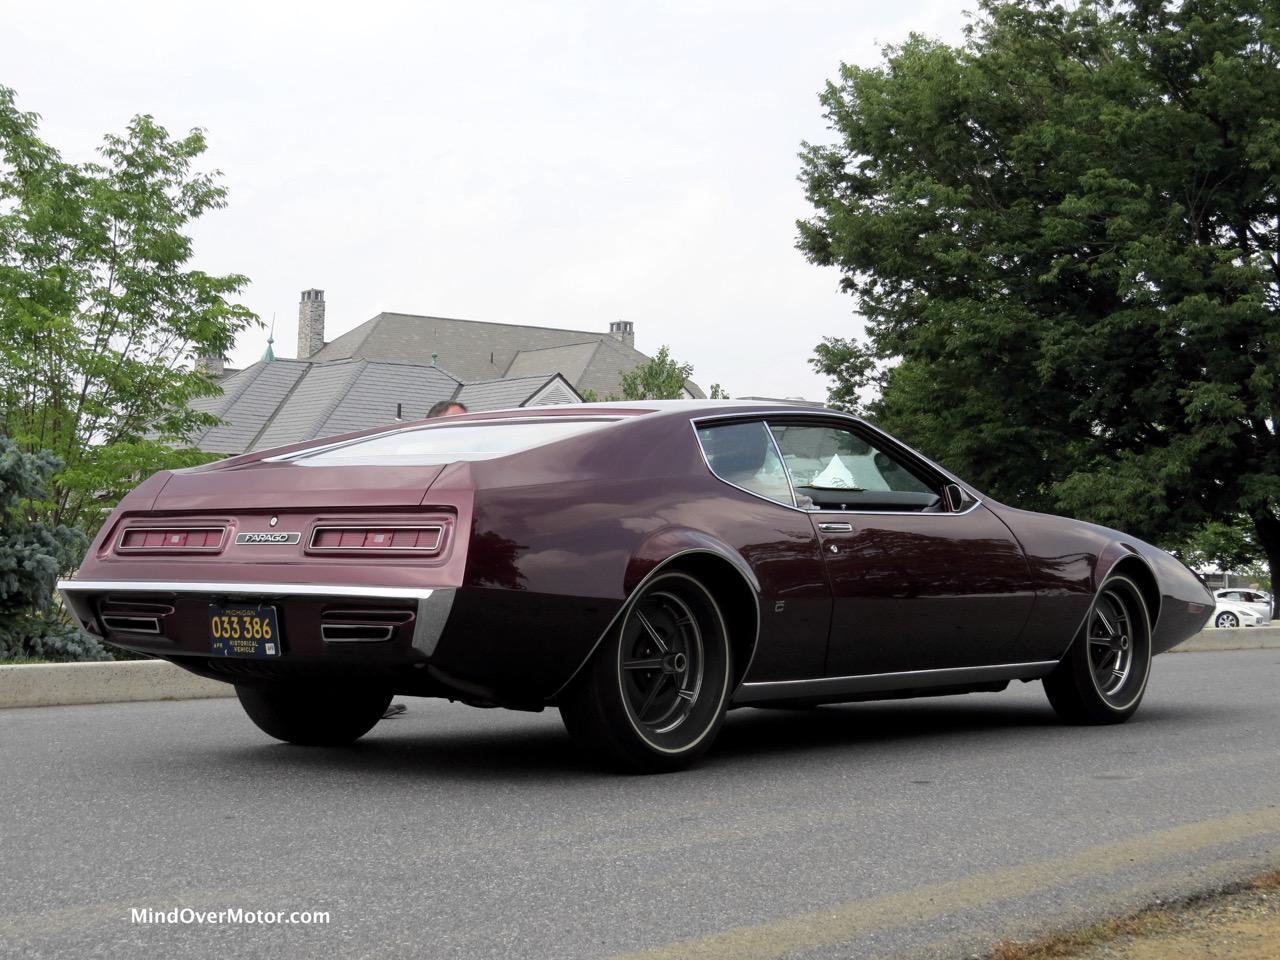 1280 x 960 jpeg 349kB, 1969 Farago CF428 Coupe at the 2015 Elegance at ...